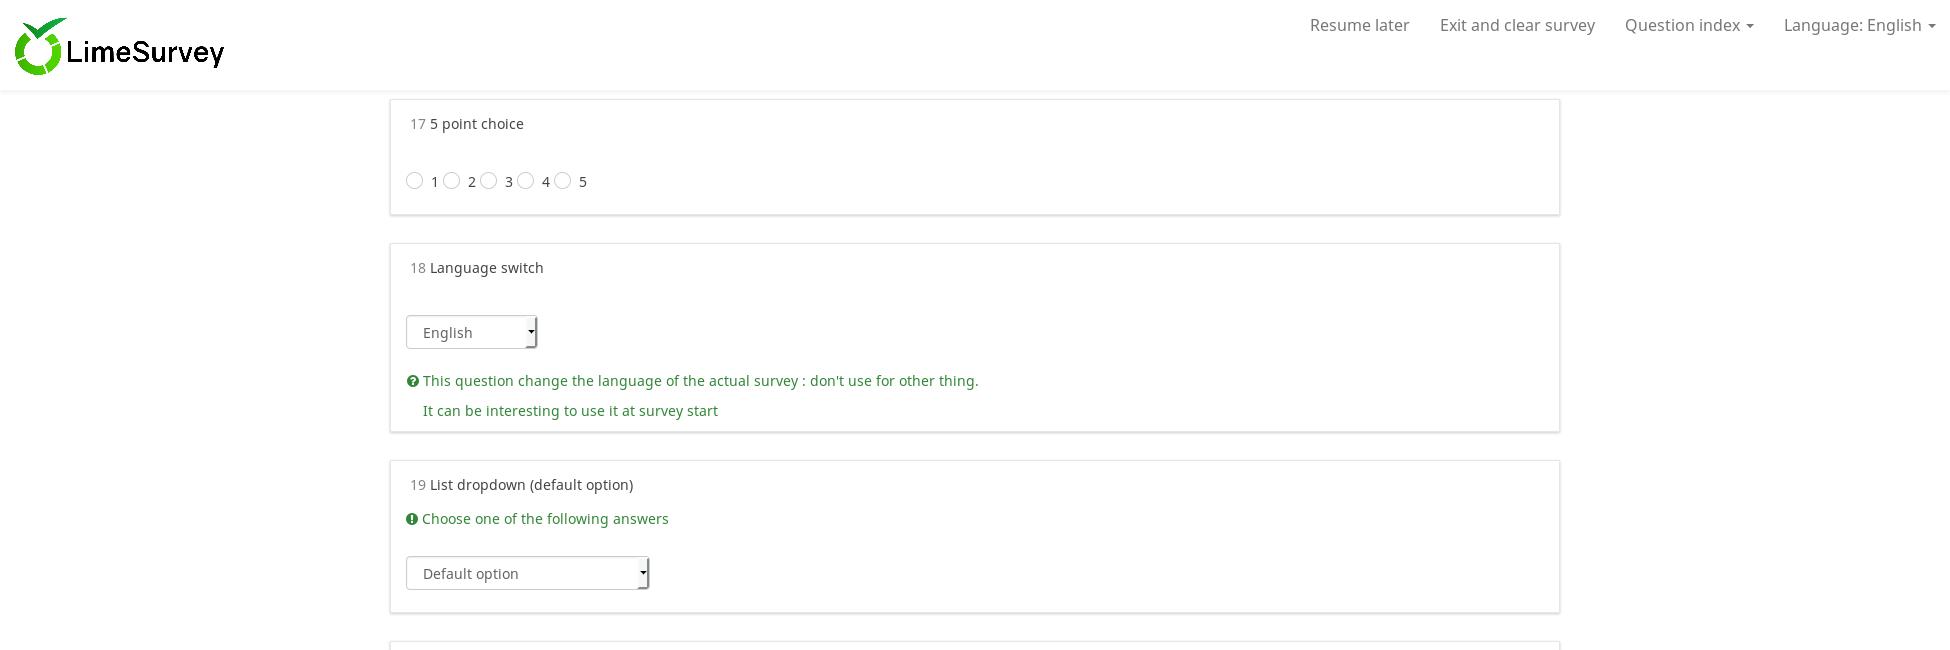 LimeSurvey CE Screenshot 4